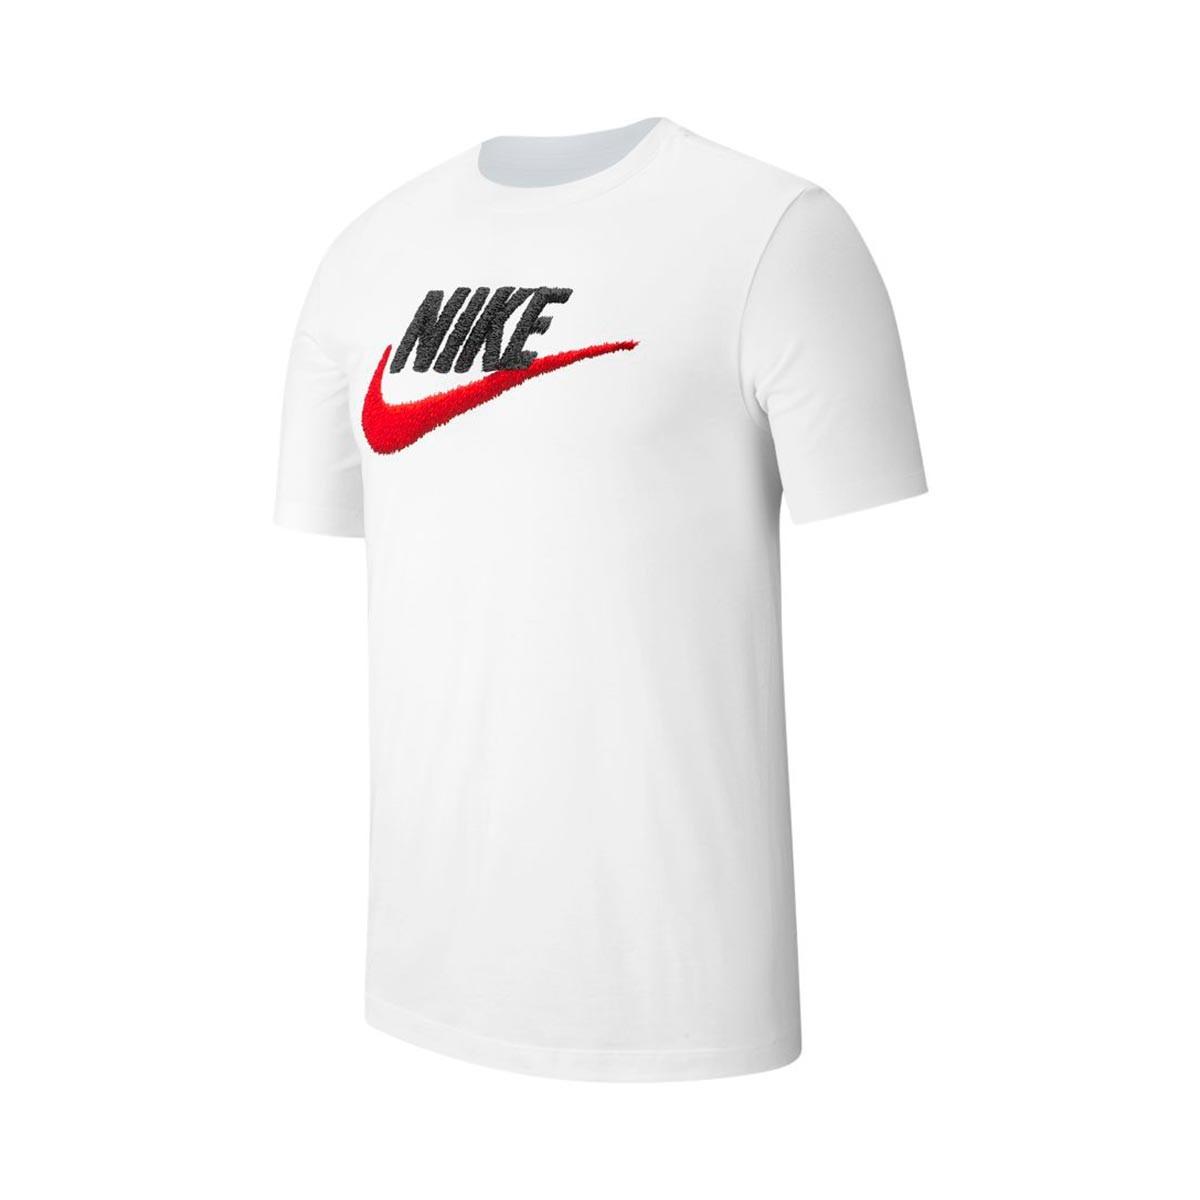 camisetas tecnicas nike grandes cantidades